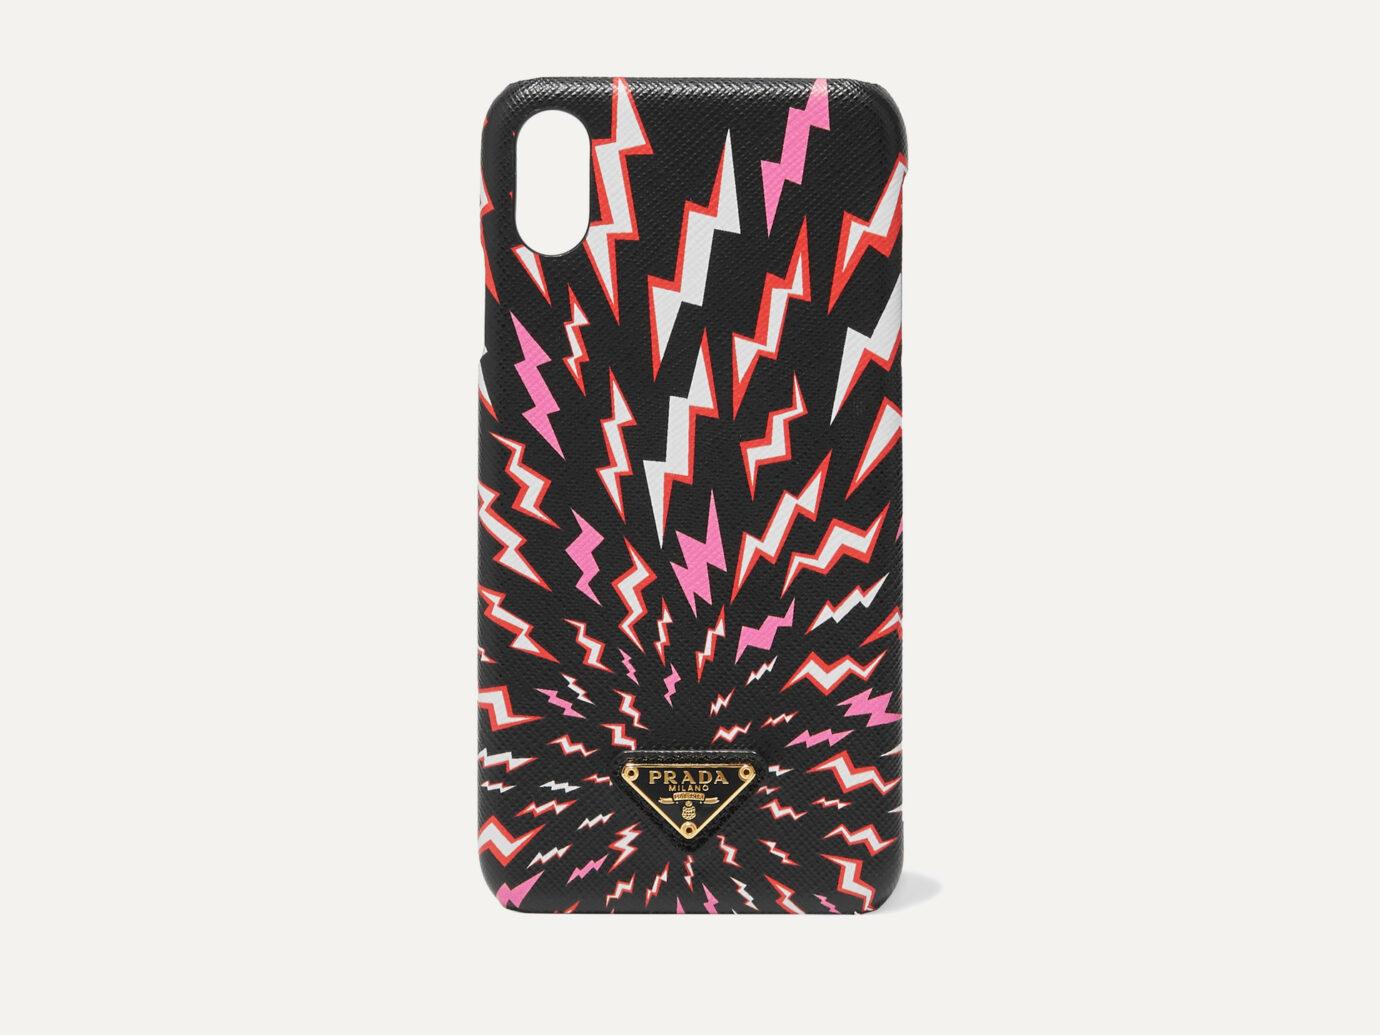 Prada Printed Textured-Leather iPhone XS Max Case